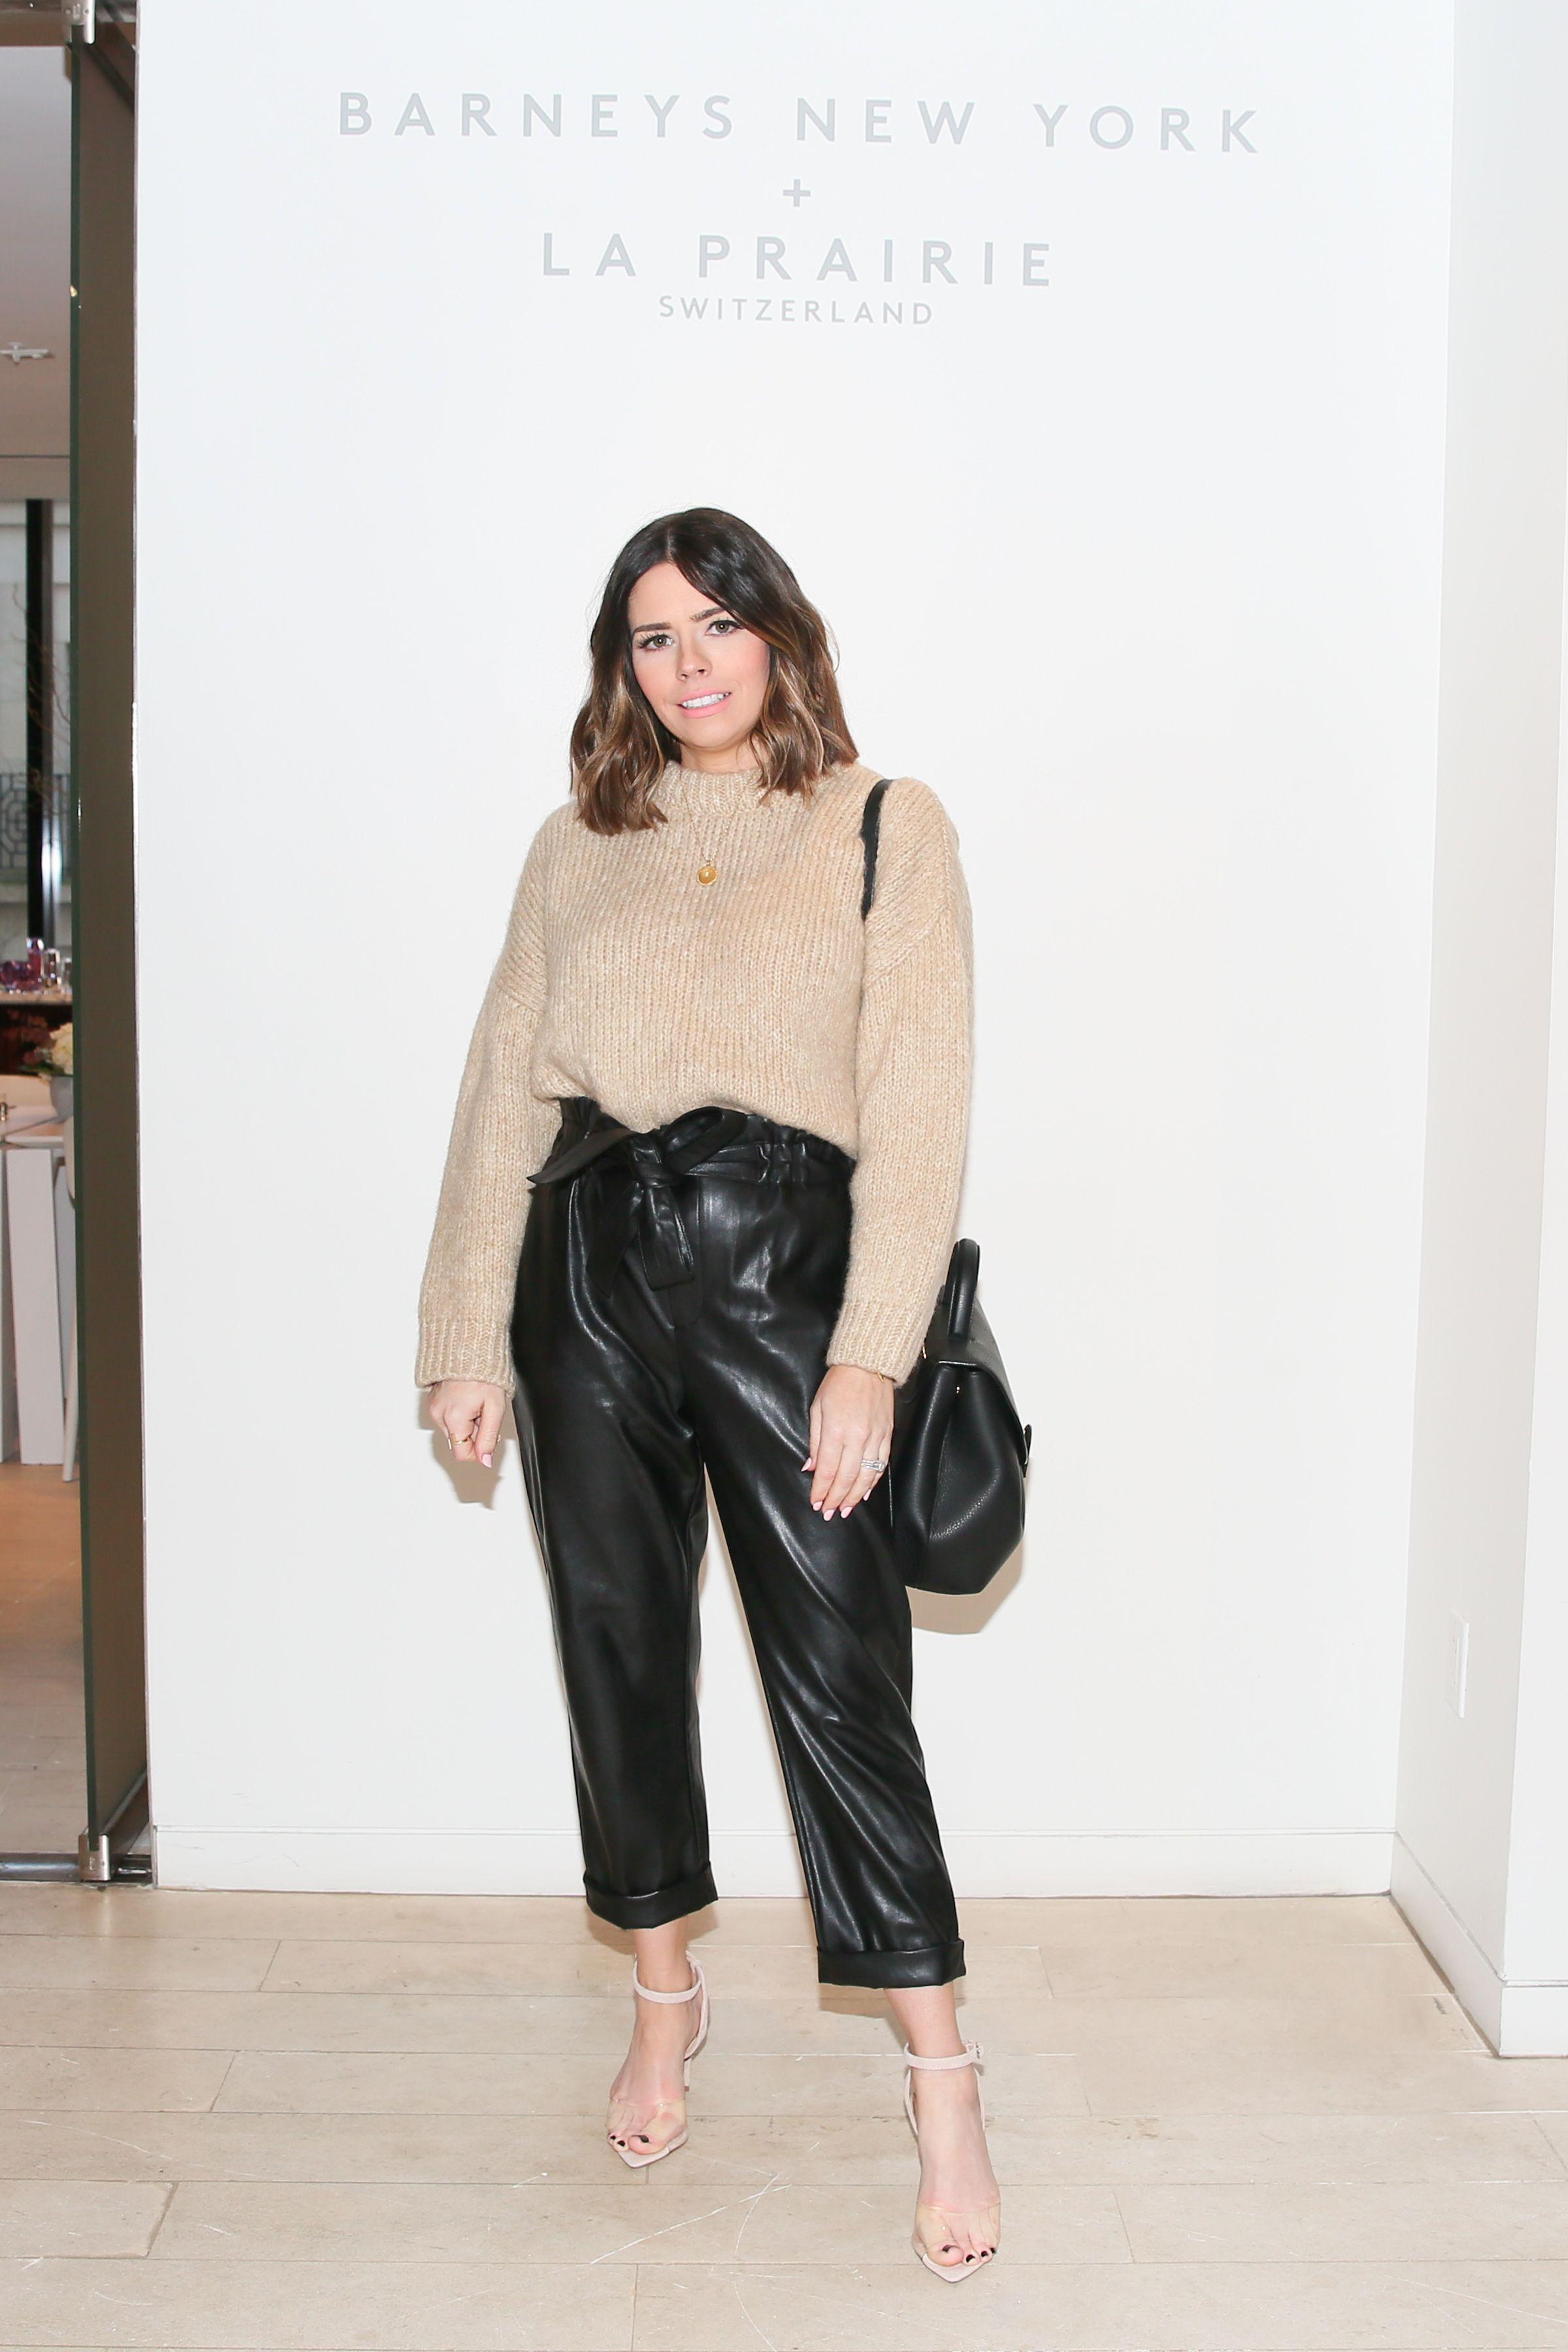 Tiffany Jais Tiffany Jais attends Barneys New York Madison Avenue to celebrate the launch of La Prairie on February 28.